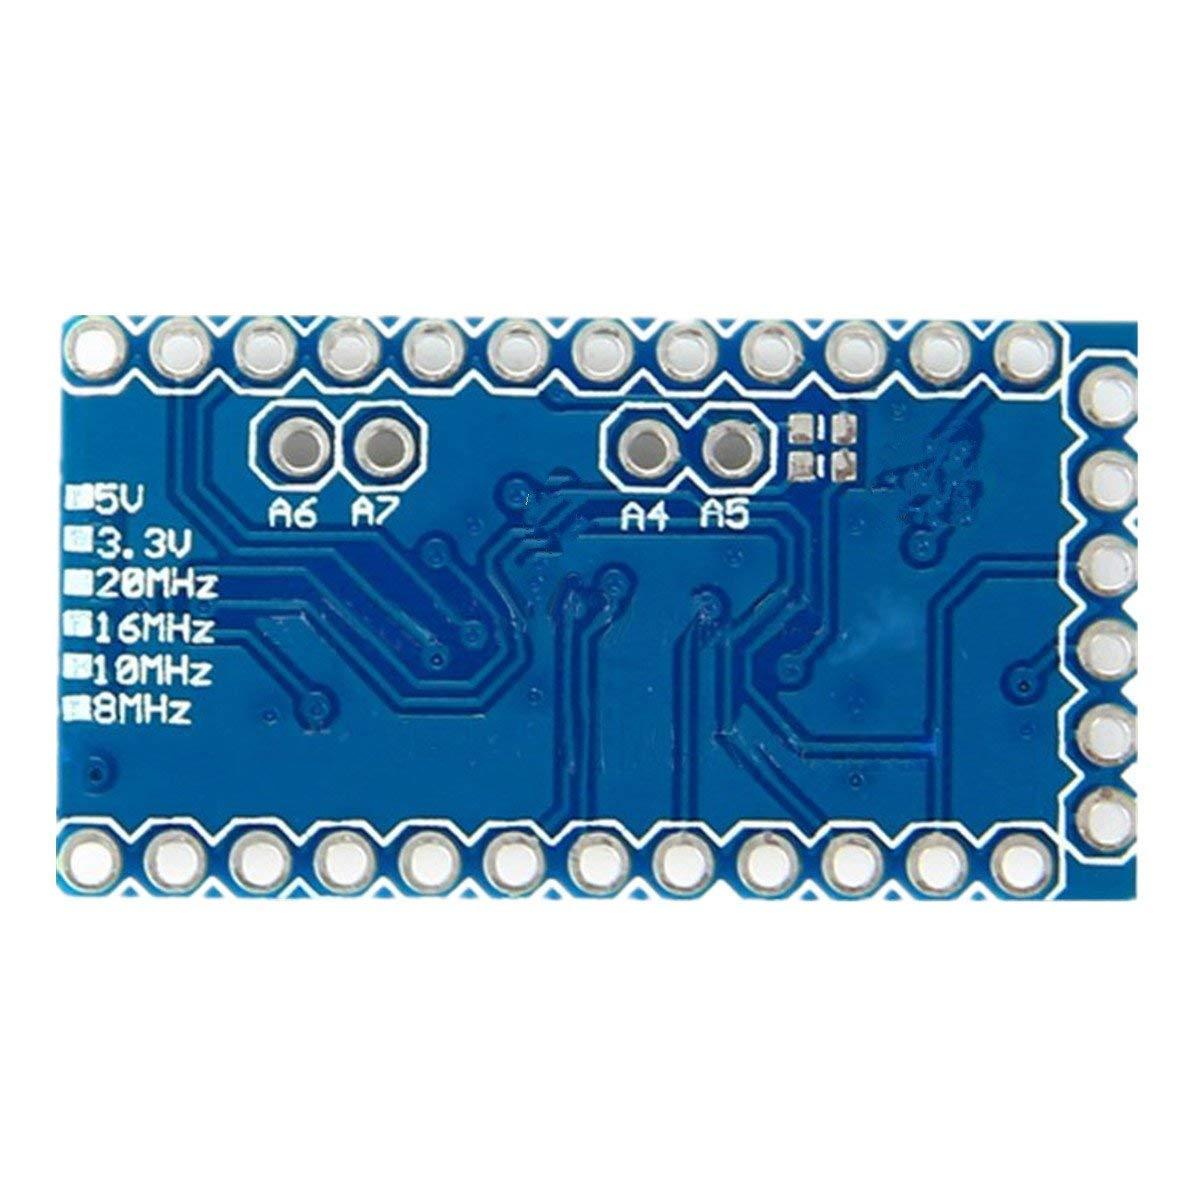 IZOKEE Nuevo Dise/ño Pro Mini ATMEGA328P 3.3V 8MHz M/ódulo Placa de Desarrollo Reemplazar ATmega128 Microcontrolador para Arduino Pro 3 x Nuevo Dise/ño 3.3V 8MHz